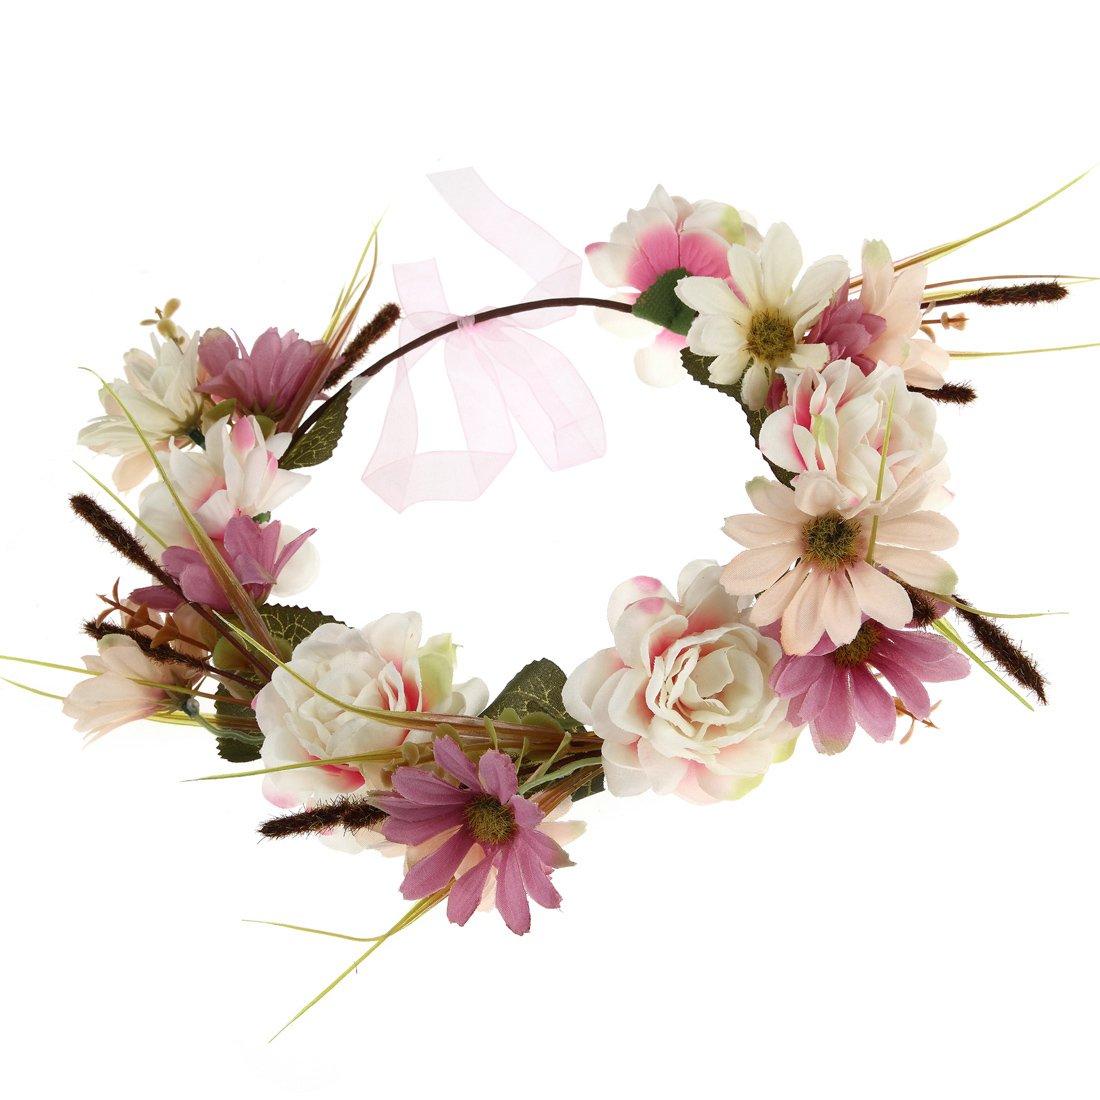 Flower Crown Wreath Headbands Women Girls Handmade Boho Floral Garland Wedding Birthday Party Photos Festival (Purple Cosmos)